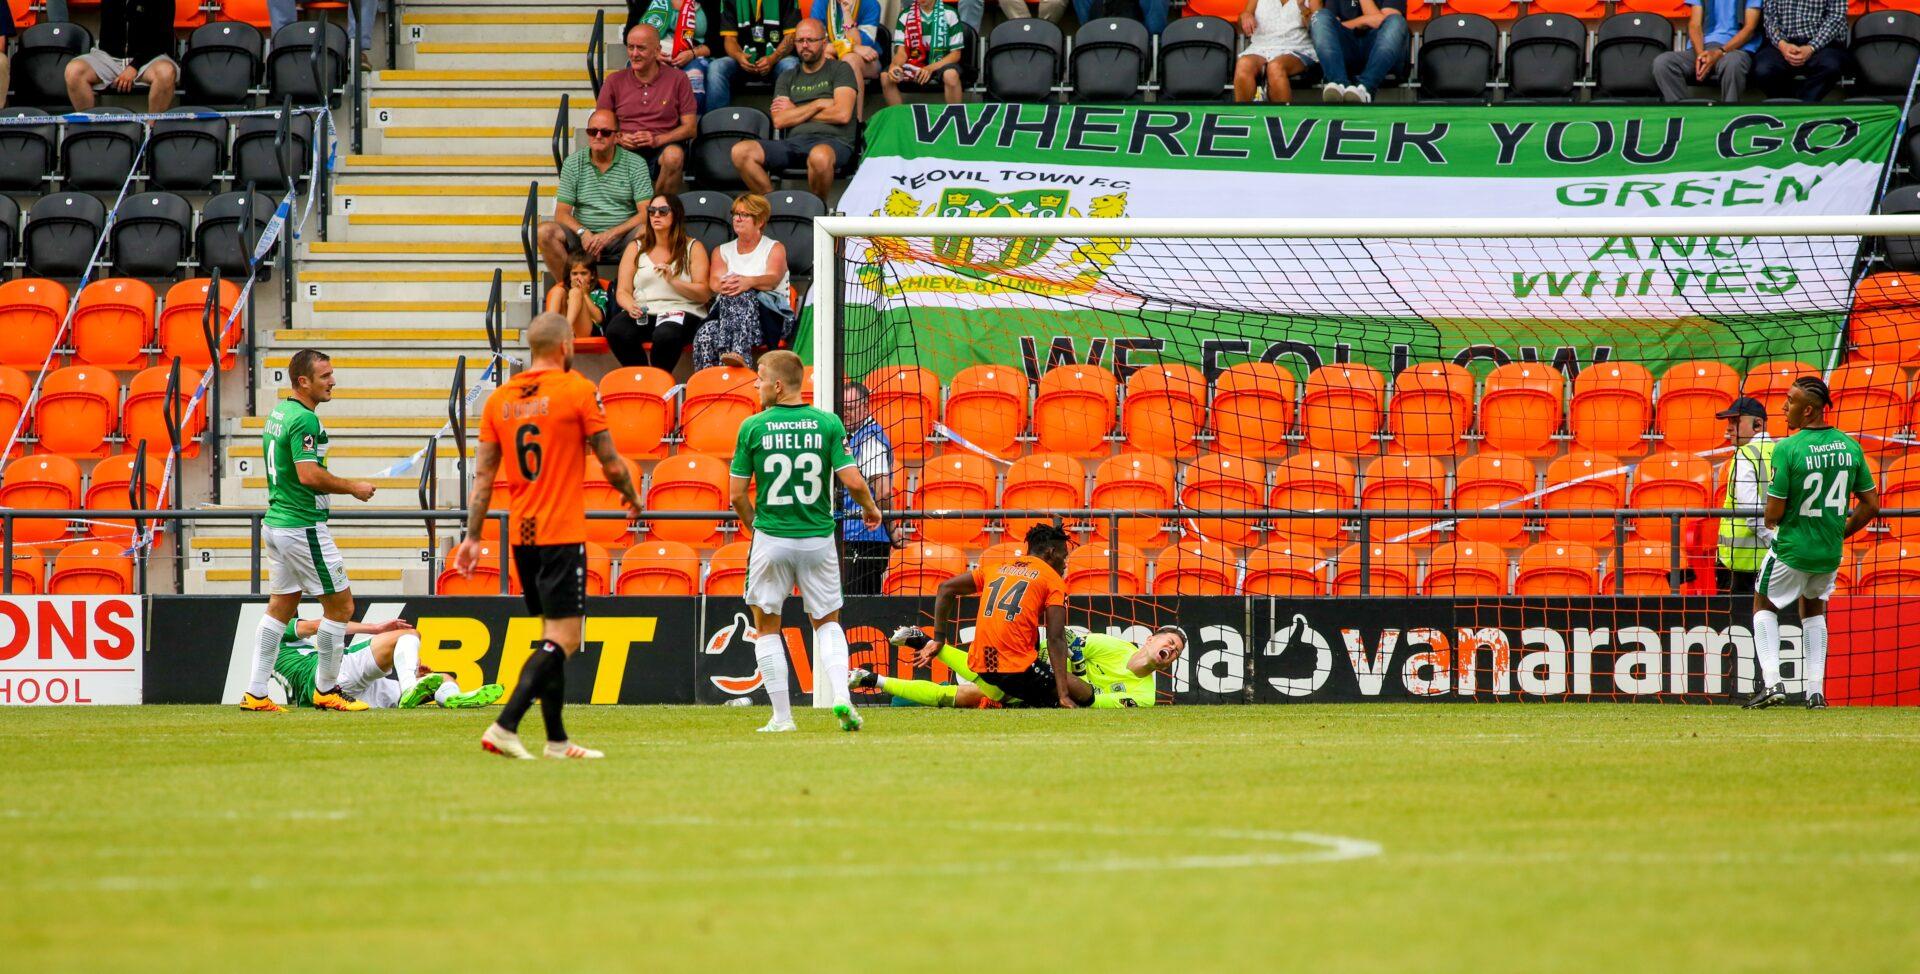 Stuart Nelson & Simeon Akinola colliding during a football match